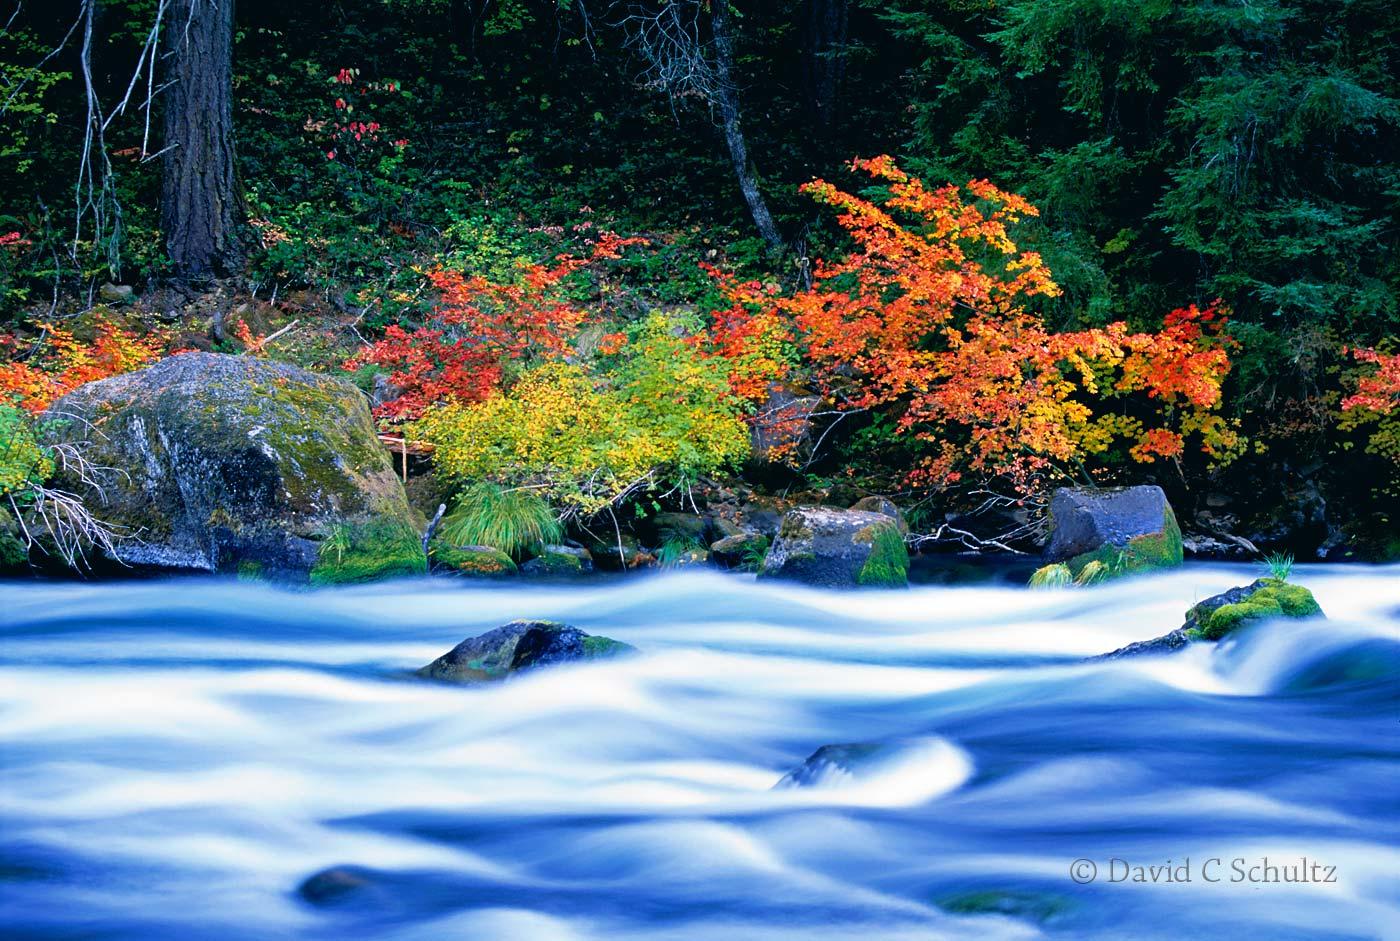 North Umpqua River, Oregon - Image #3-2363